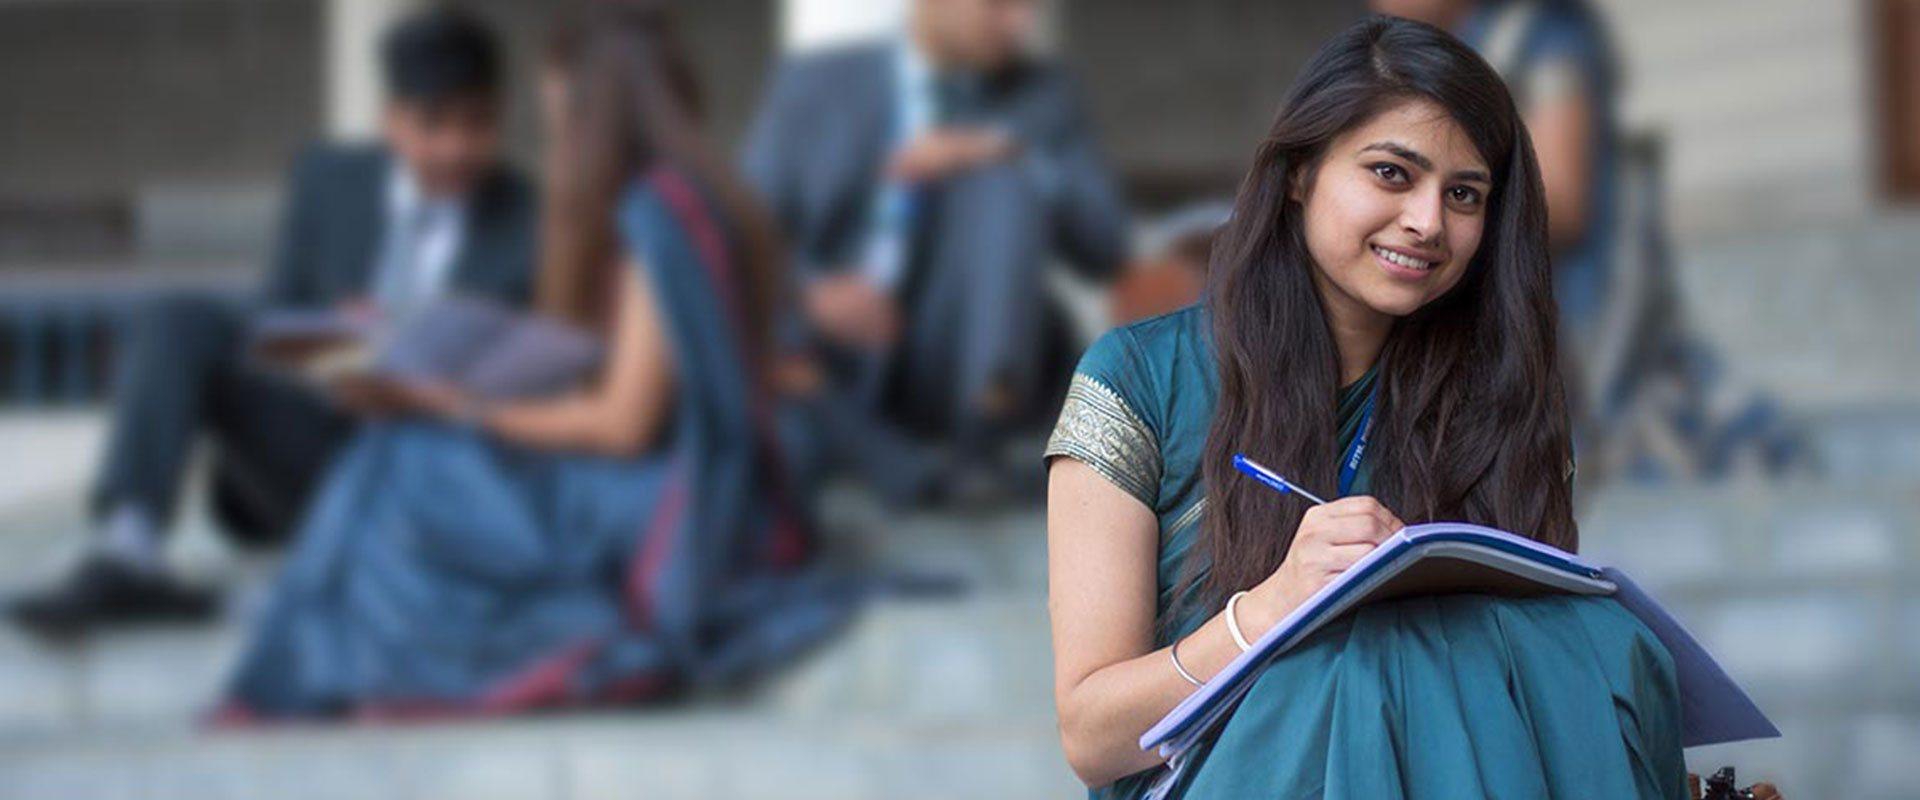 Better Education For a Better World